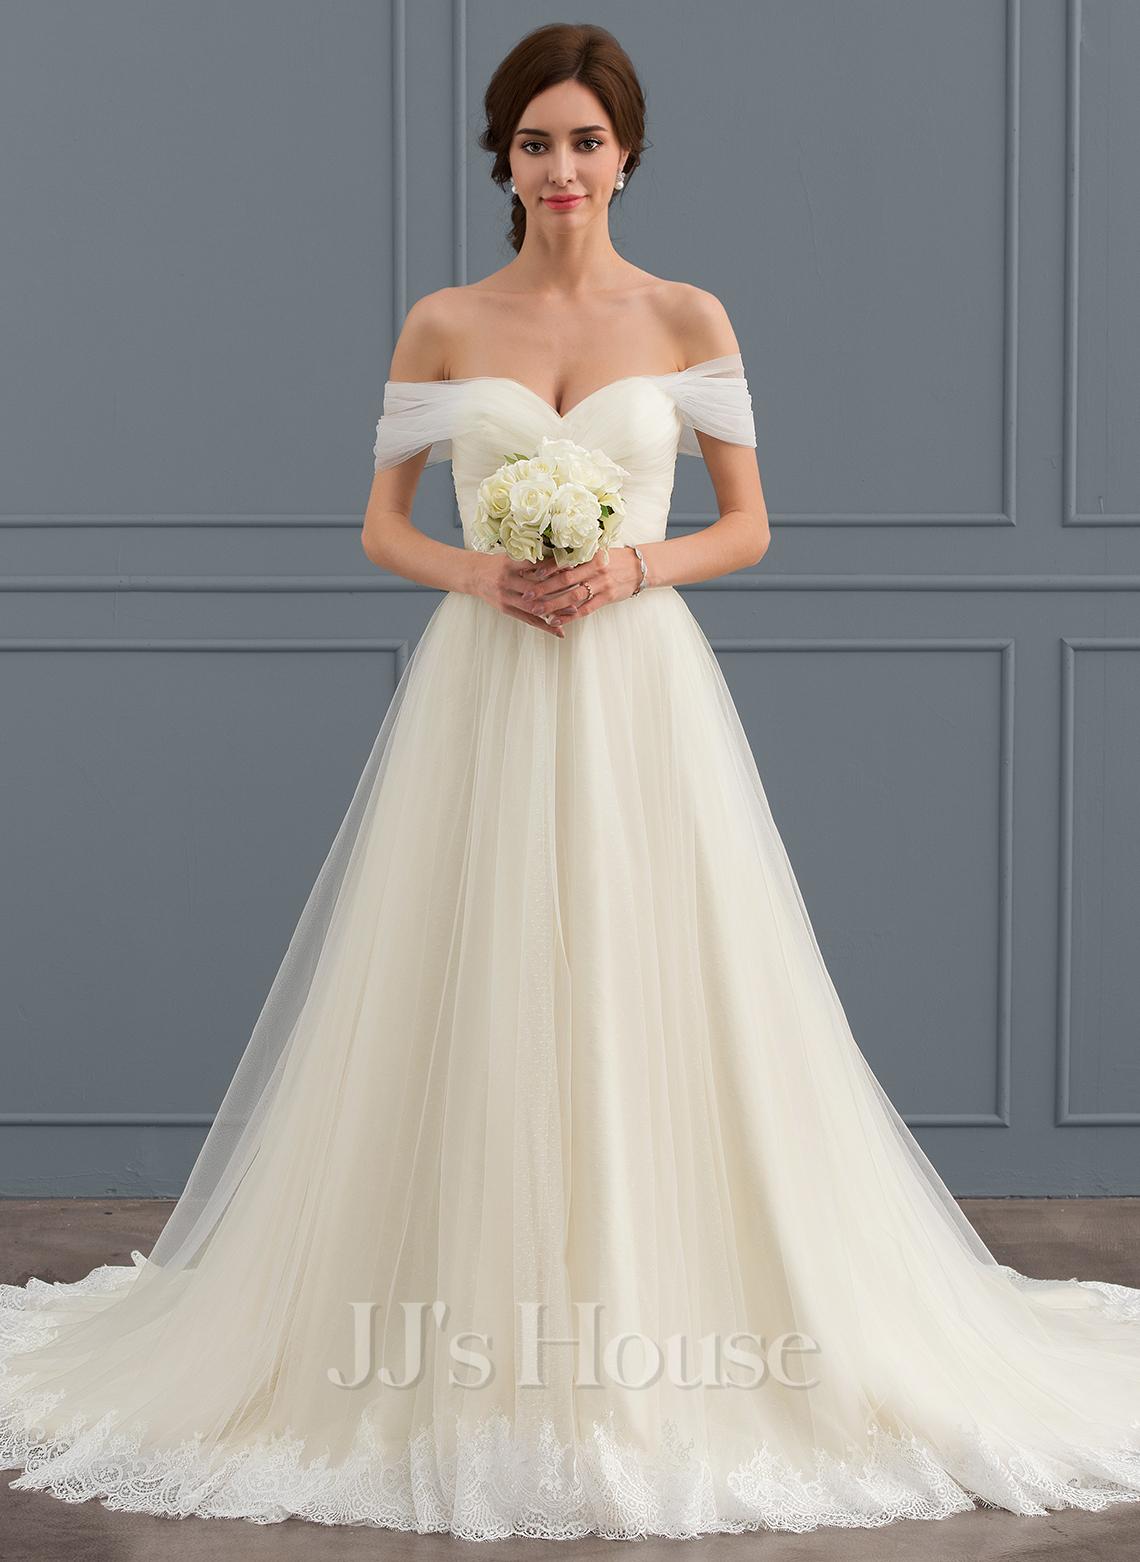 jjshouse lace wedding dress off 20   medpharmres.com